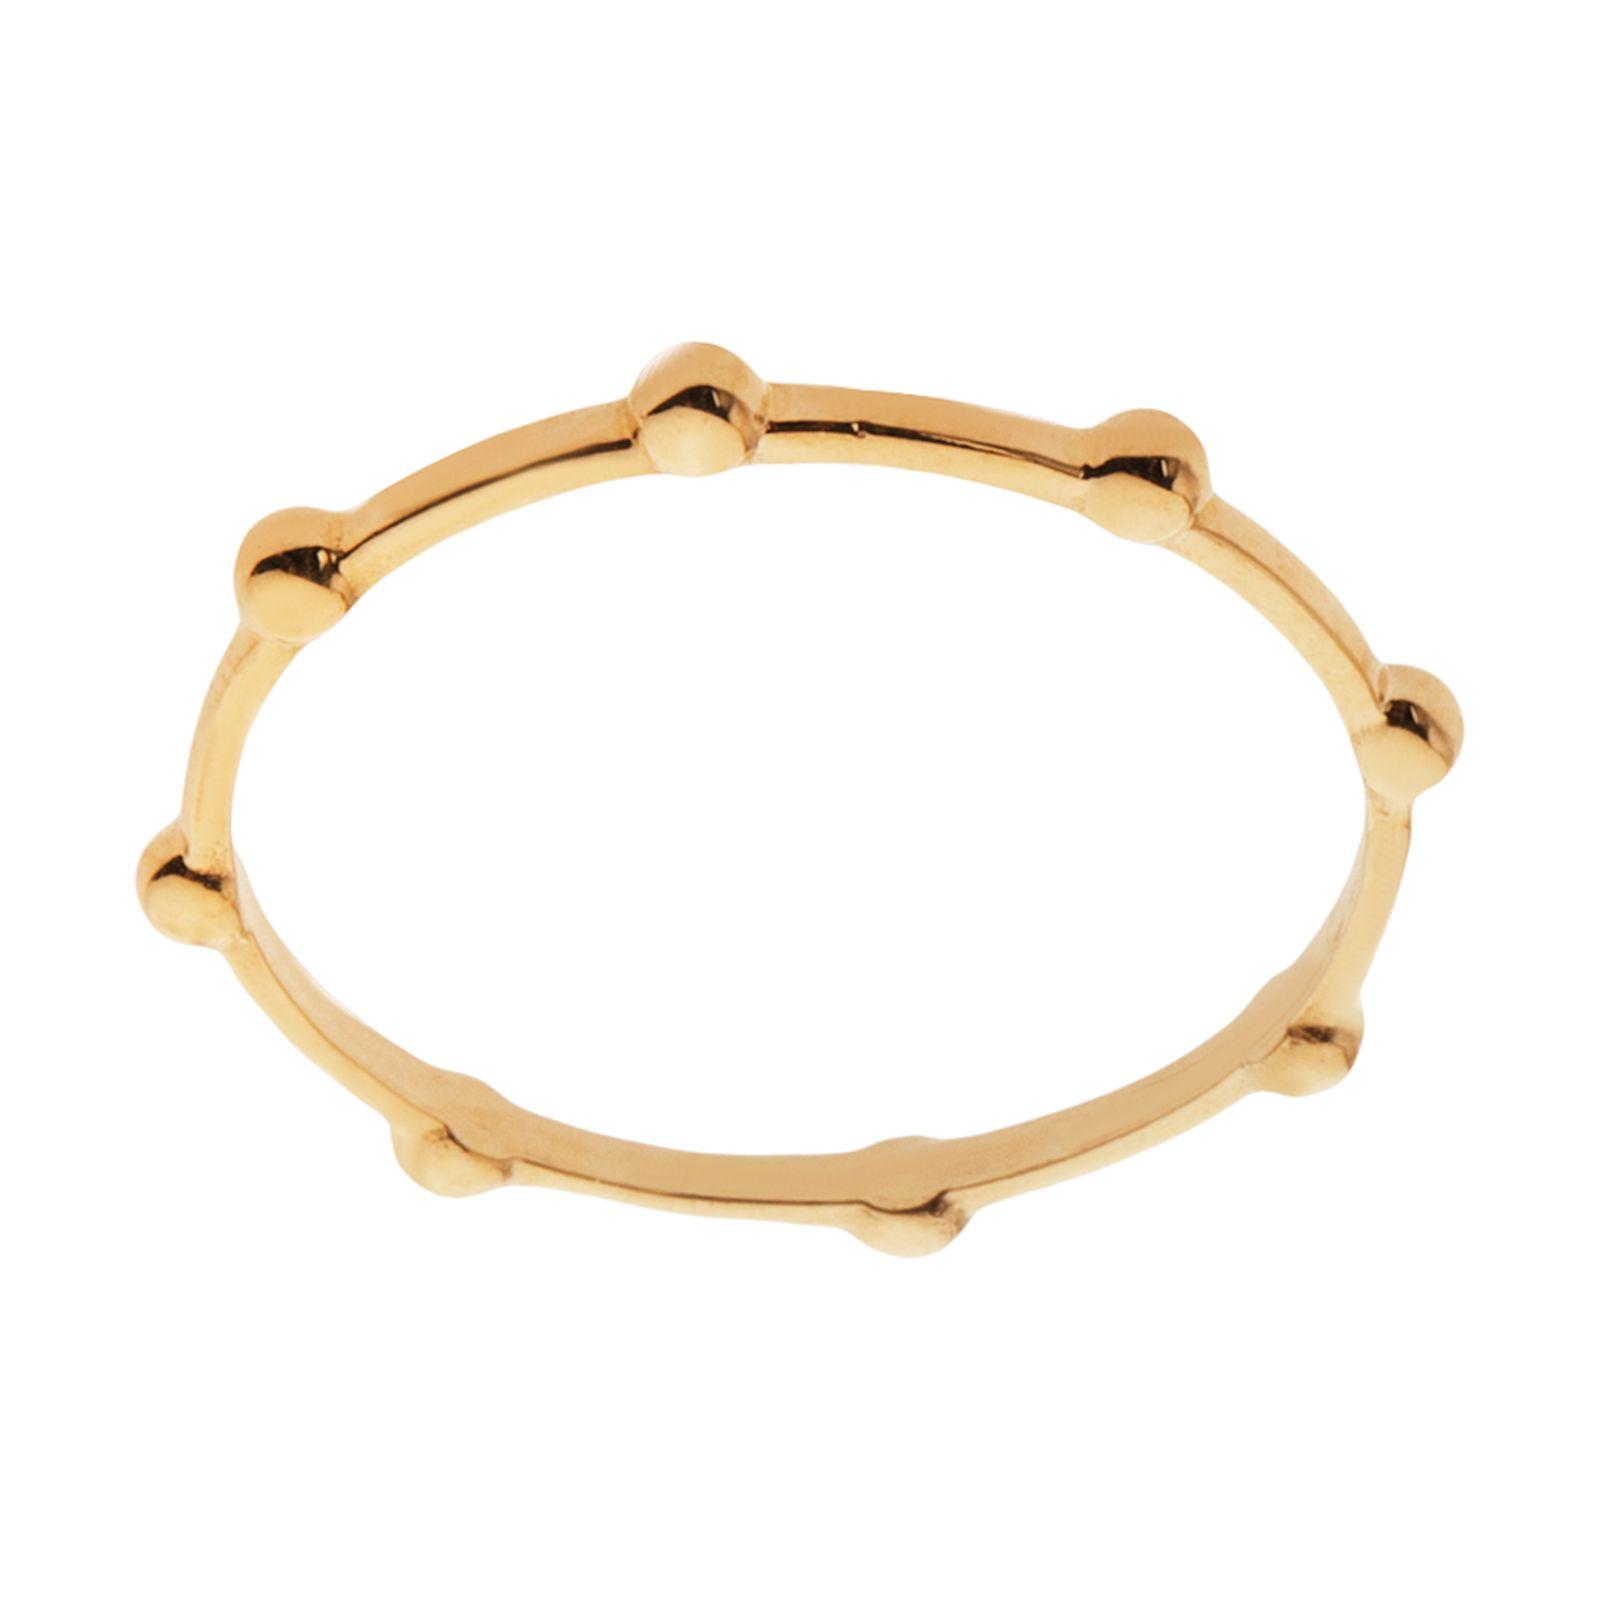 انگشتر طلا 18 عیار زنانه سنجاق مدل X090577 -  - 2